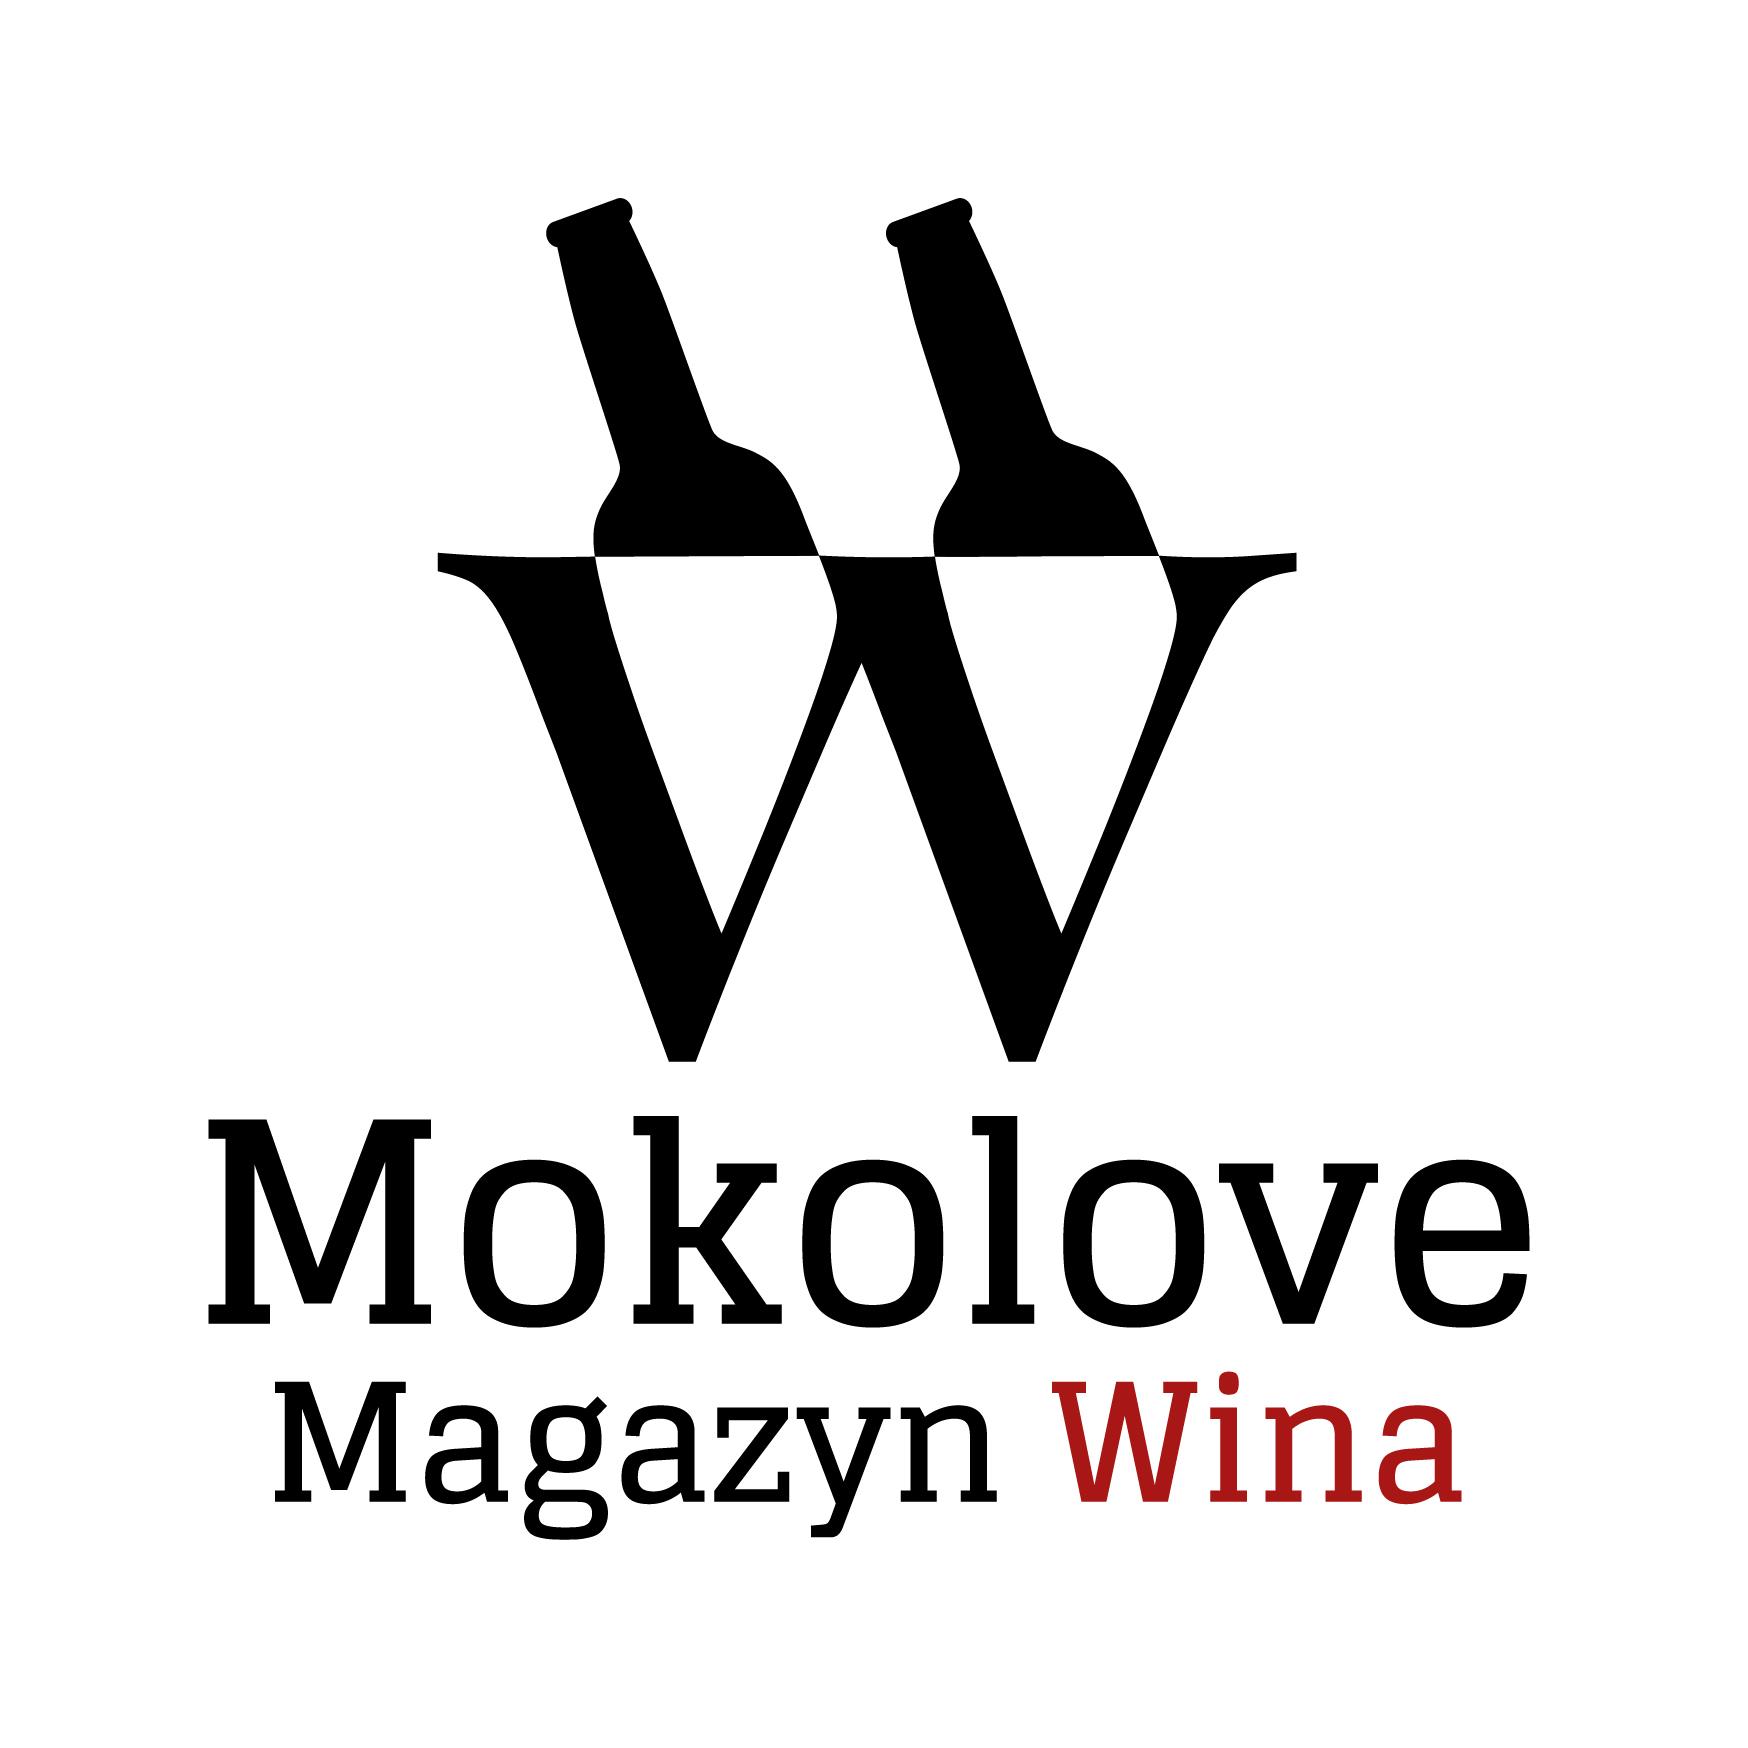 Mokolove Magazyn Wina - Logo